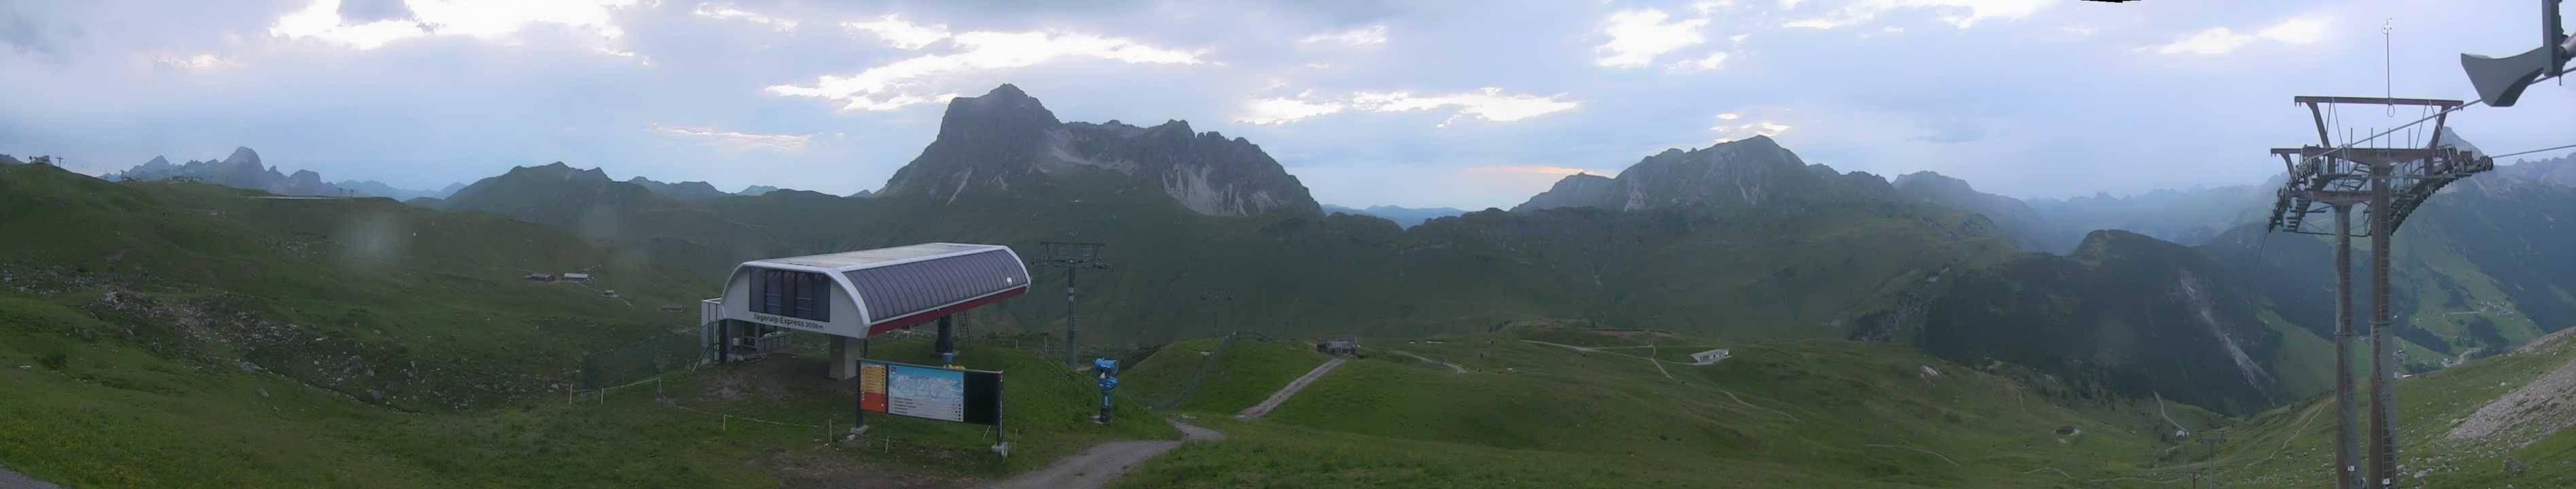 HD Panoramawebcam feratel Bergstation Wartherhorn Express, links die Bergstation Warterhonr, rechts die Bergstation Jägeralpe Express